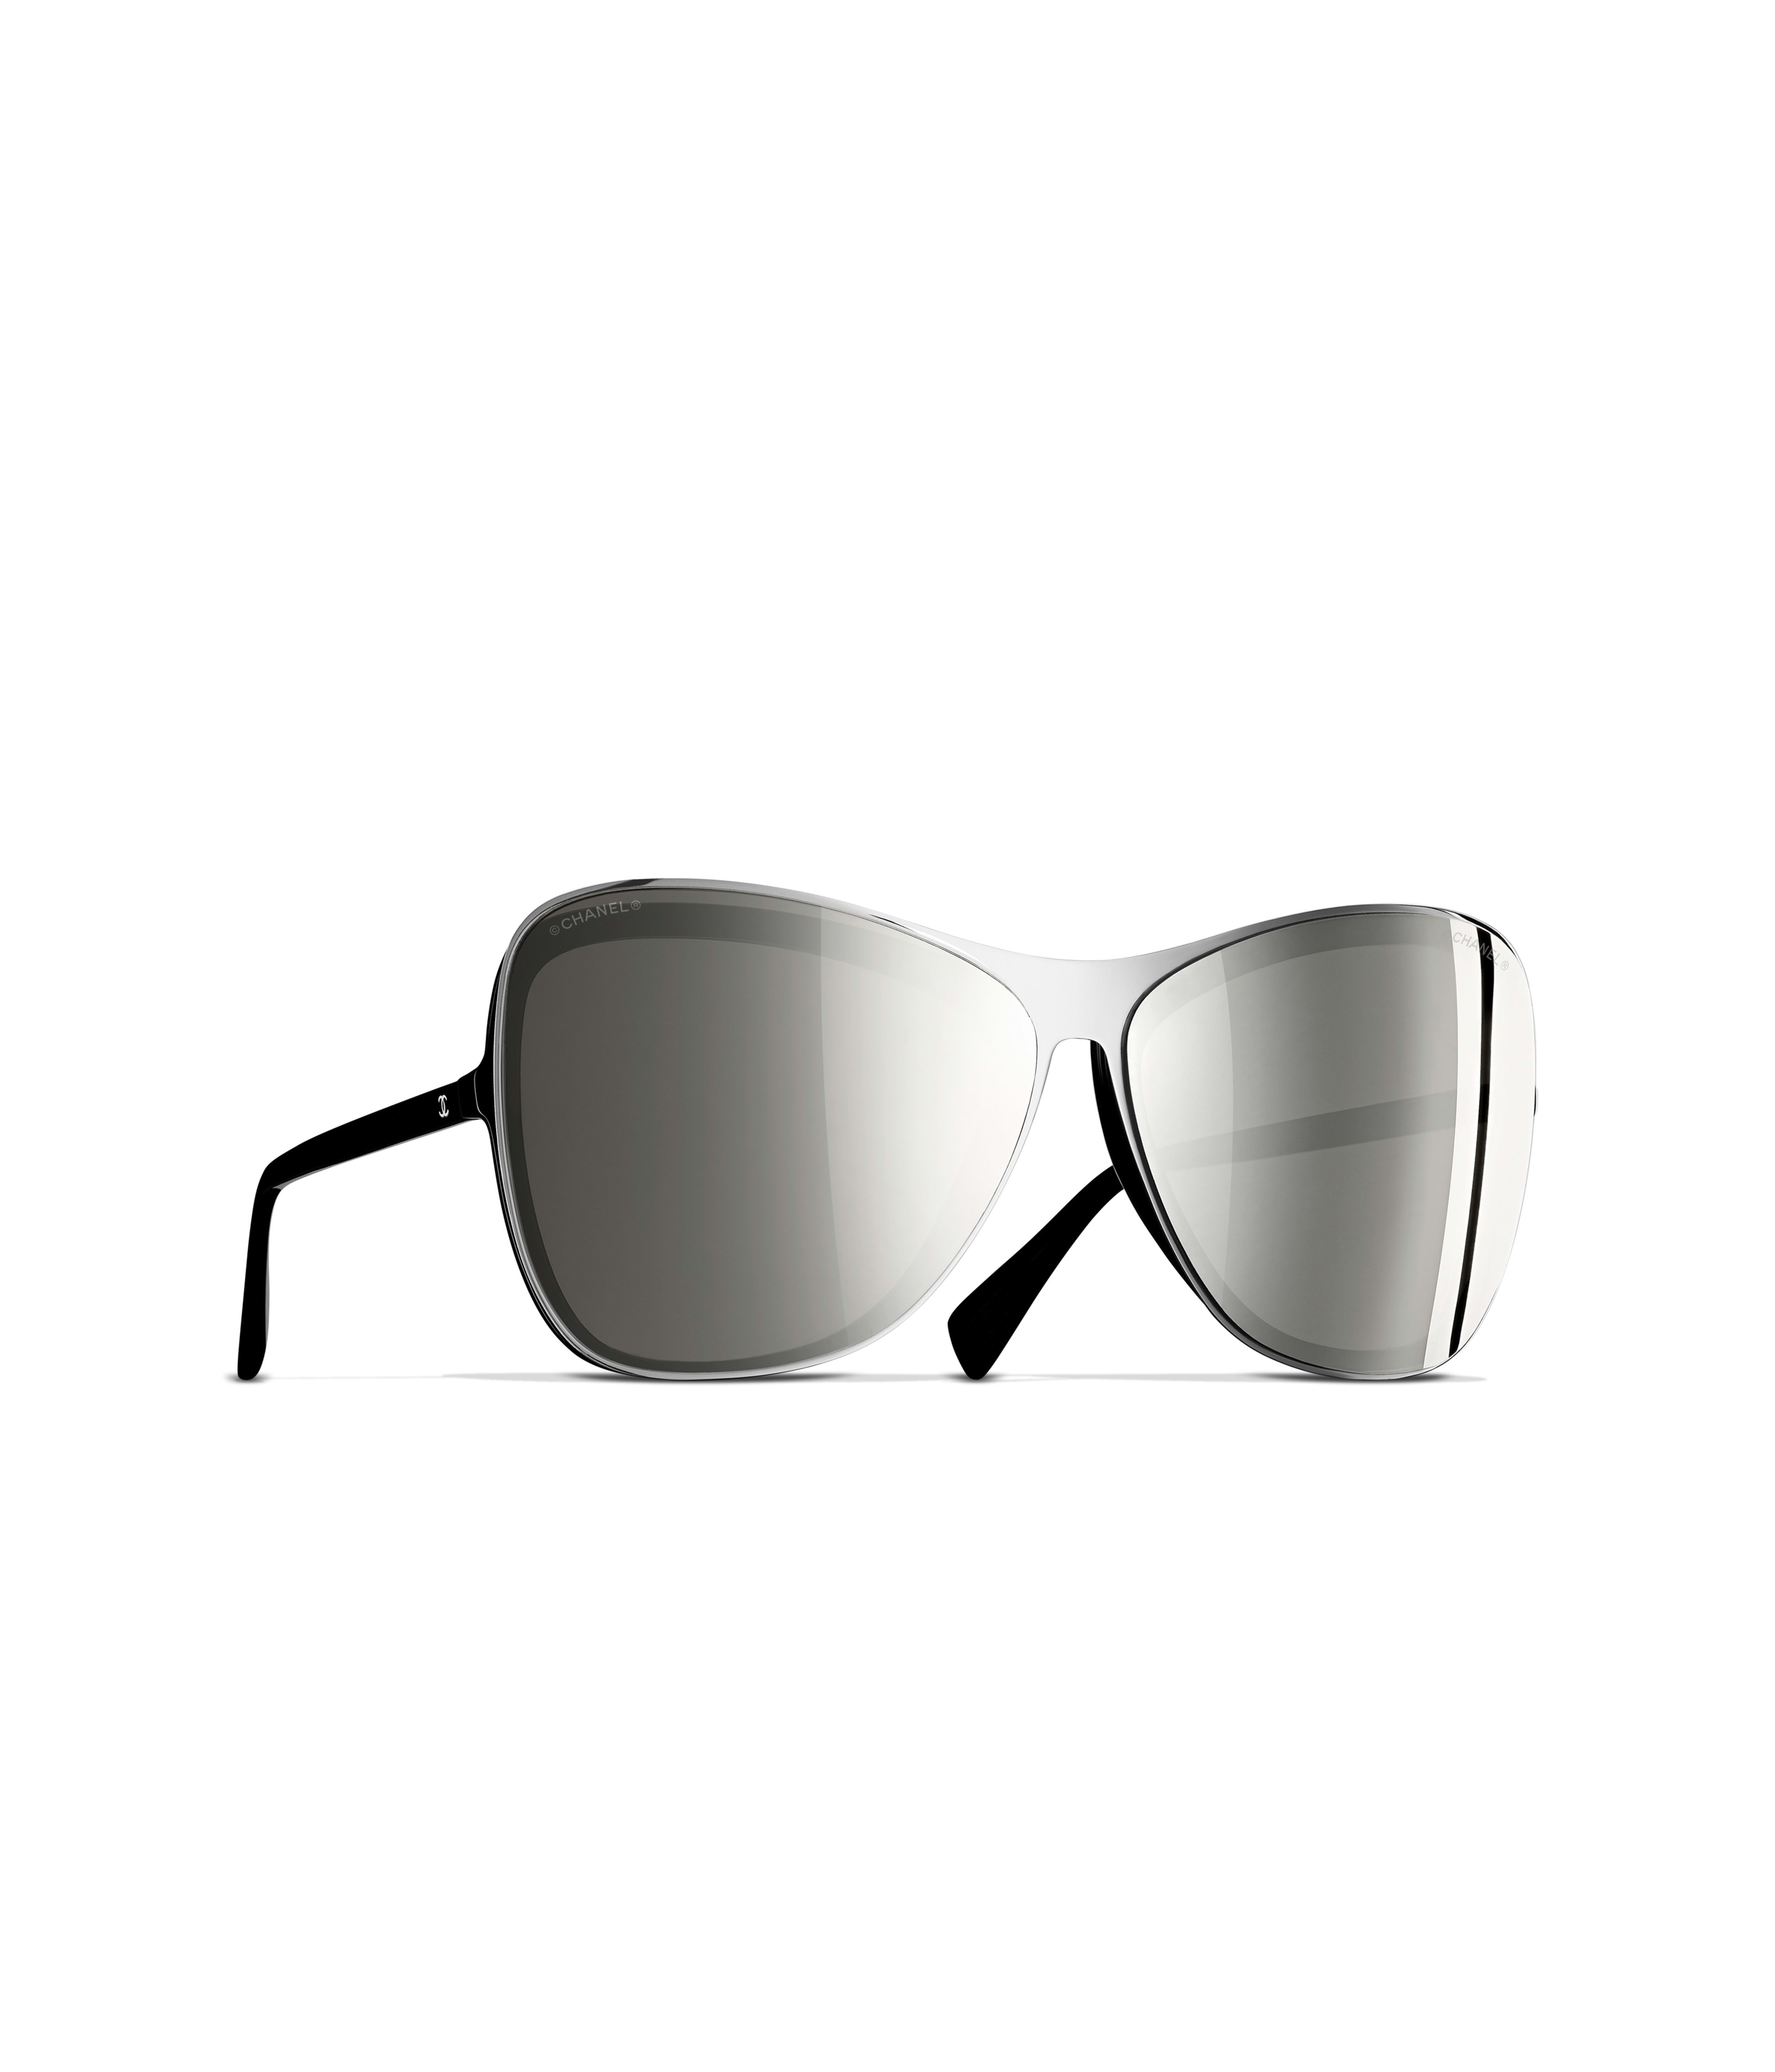 ba4ebcfadd Chanel Eyeglasses With Magnetic Sunglasses | CINEMAS 93